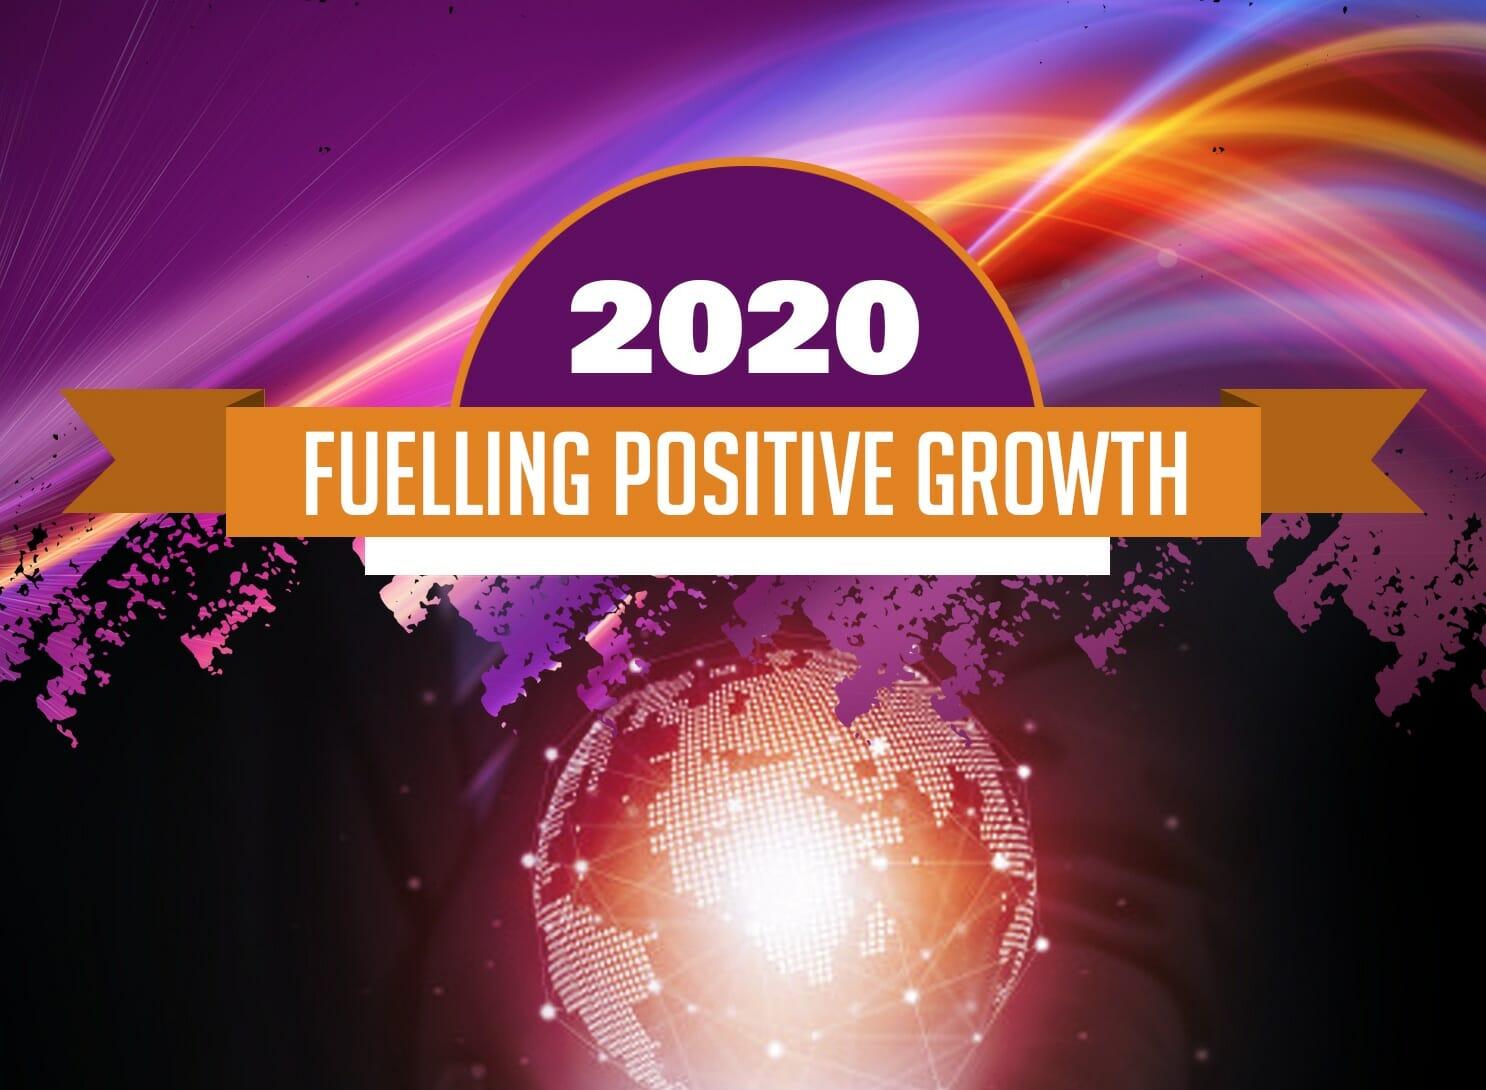 2020 Growth